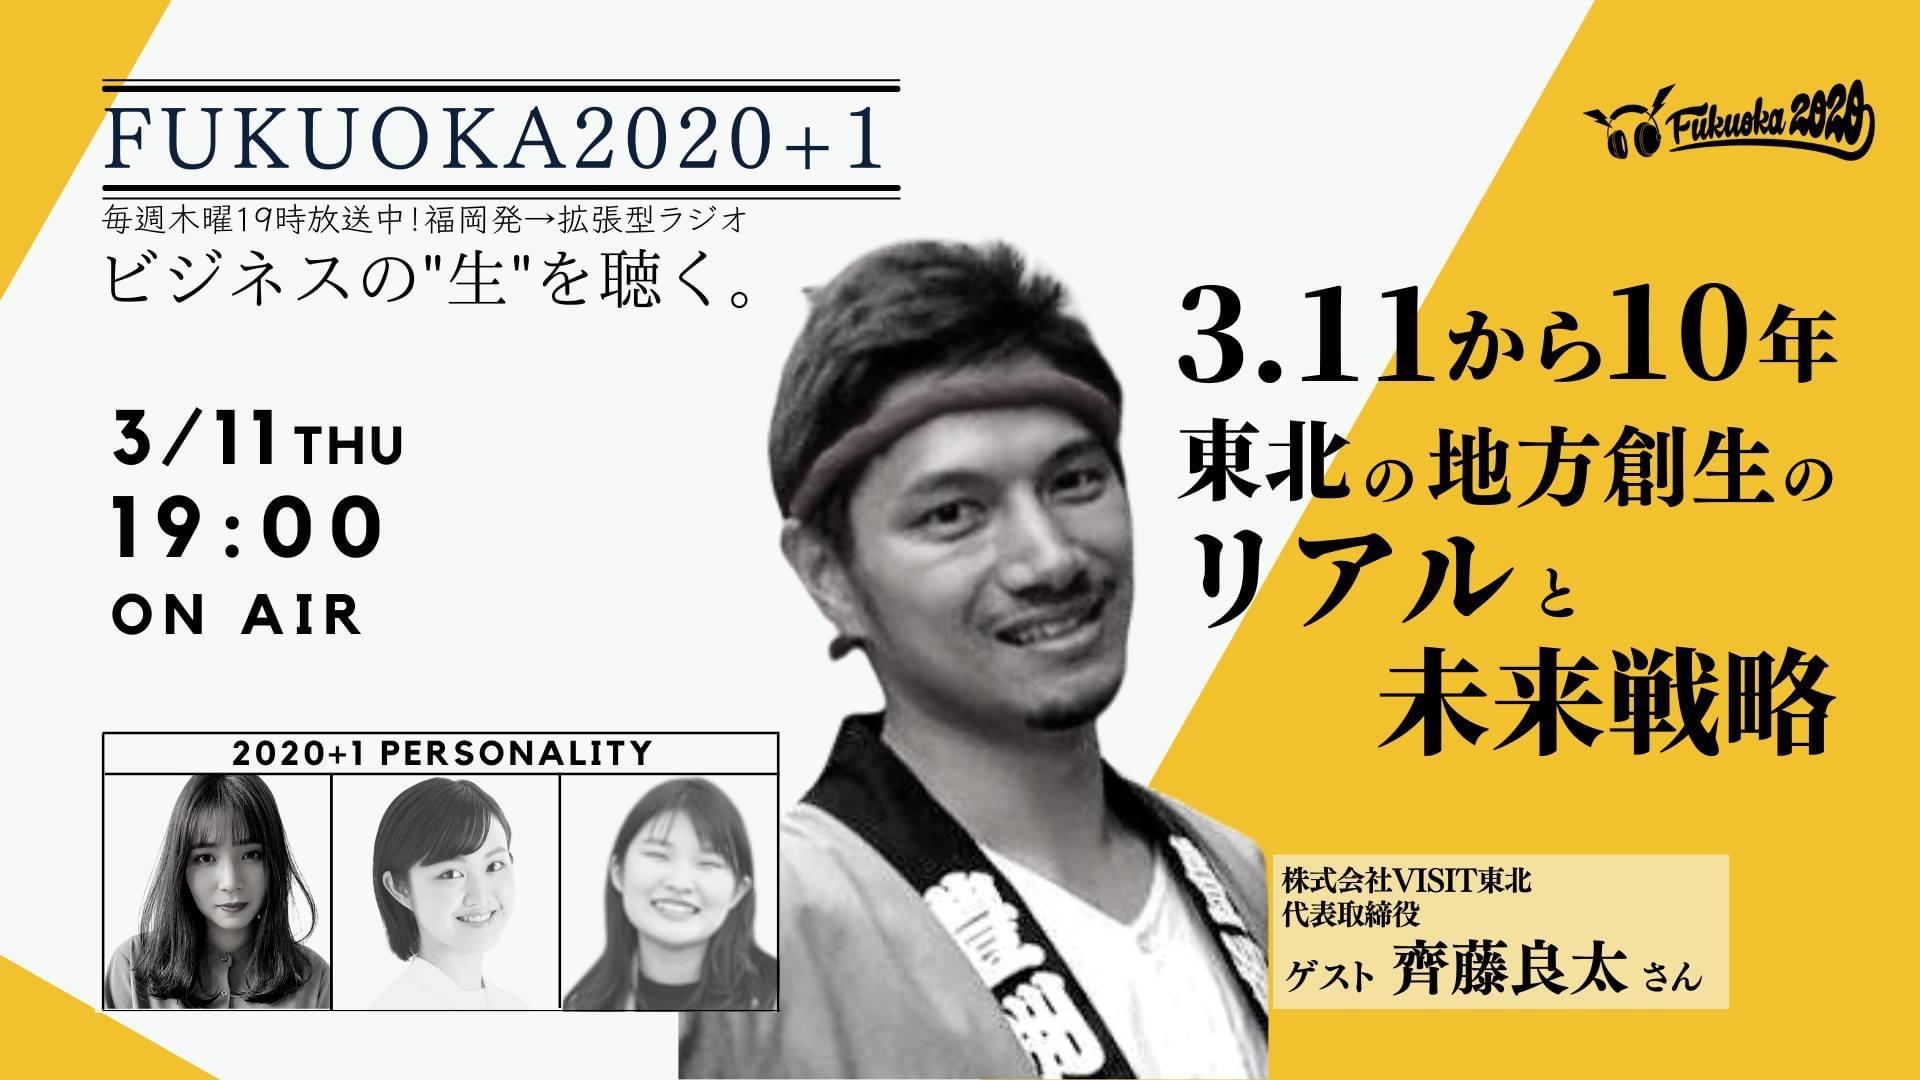 【LIVE】FUKUOKA2020 vol.128 |ゲスト: 株式会社VISIT東北 代表取締役 齊藤良太さん